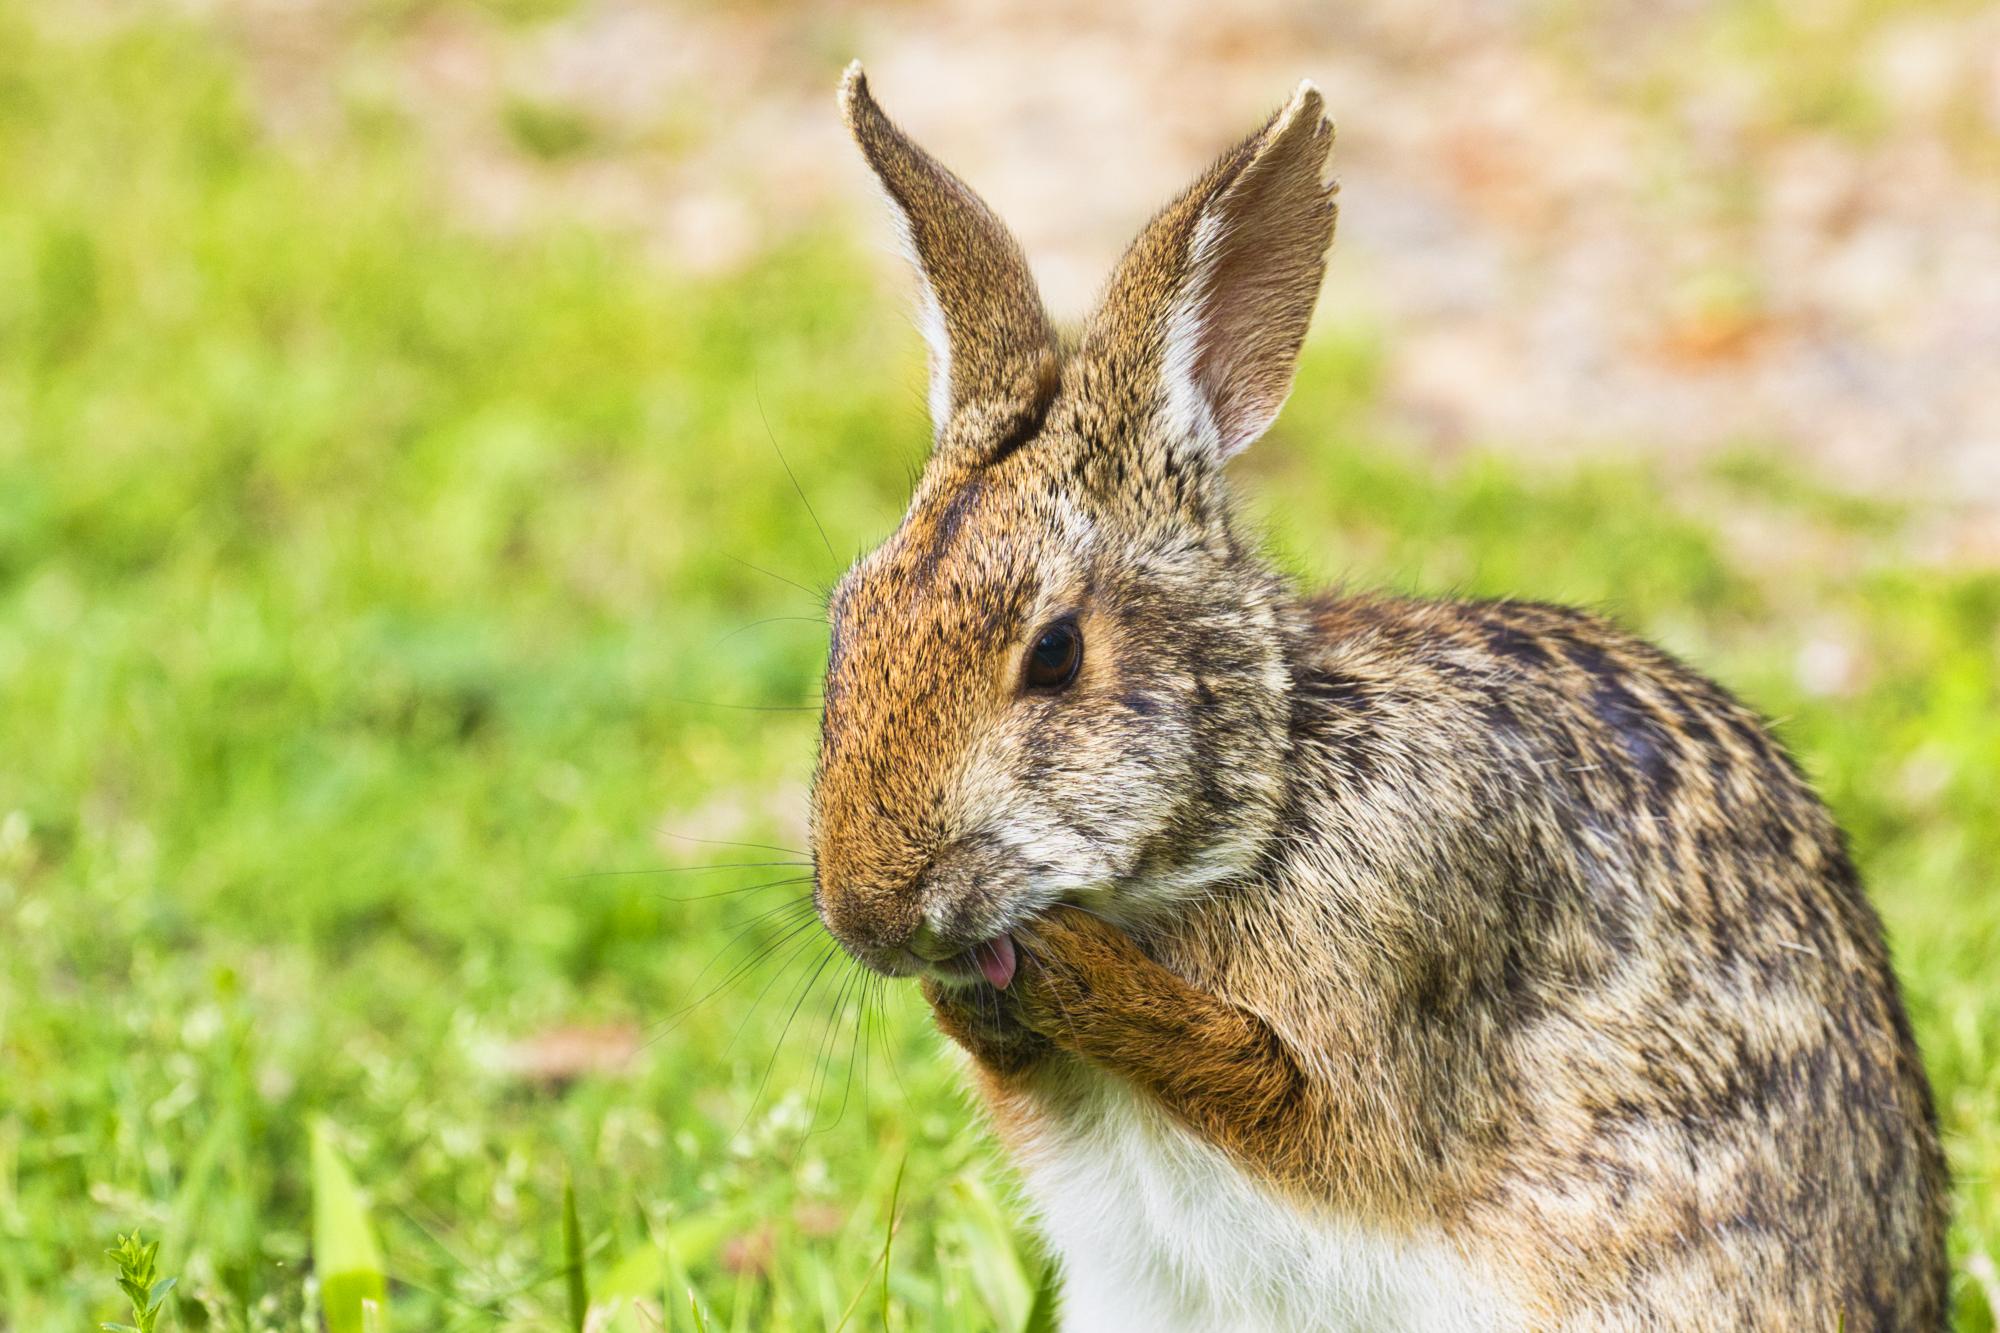 Swamp Rabbit Grooming Itself - Arkansas